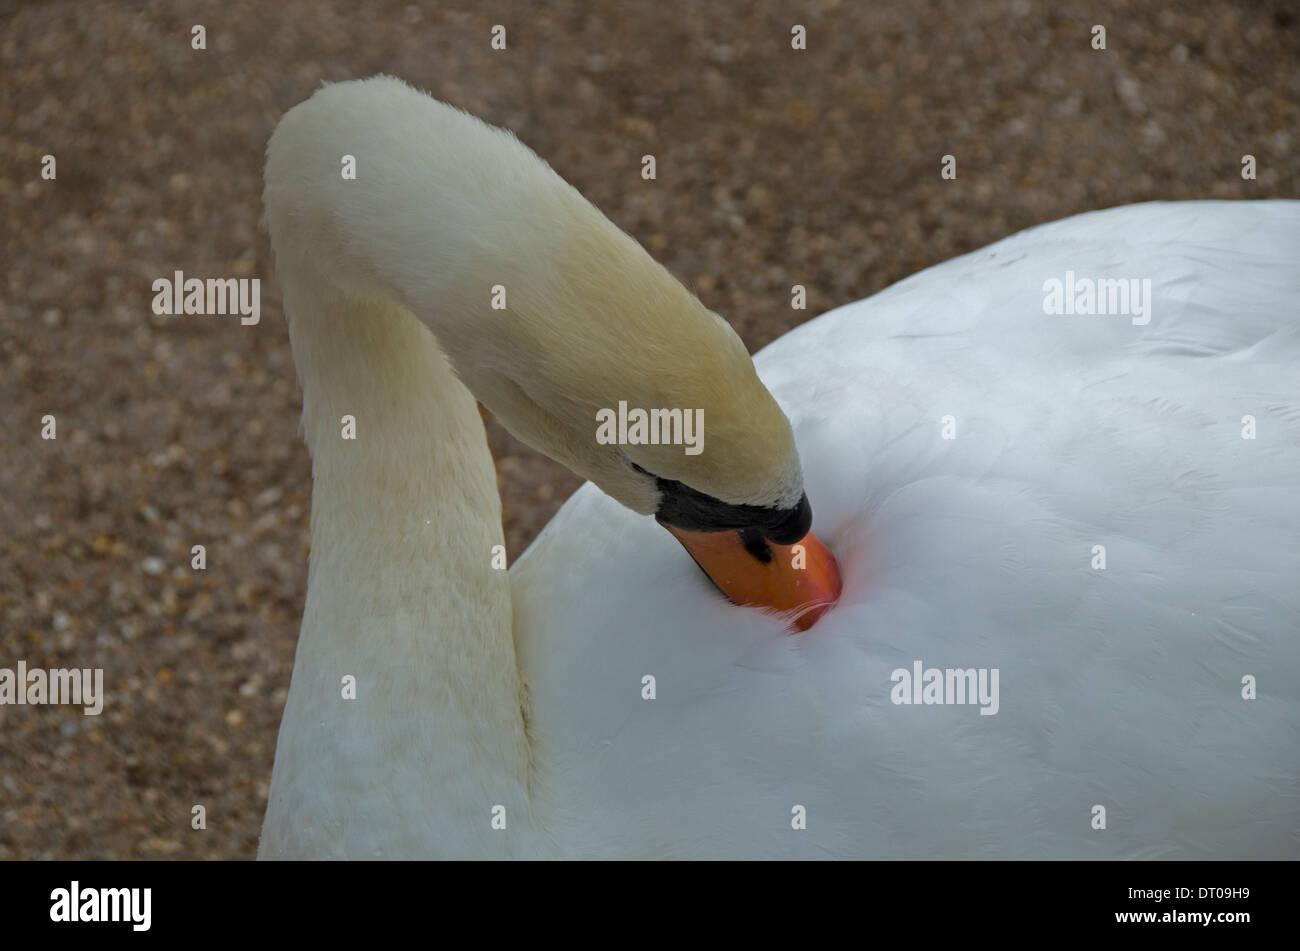 Mute swan preening at Slimbridge, England - Stock Image